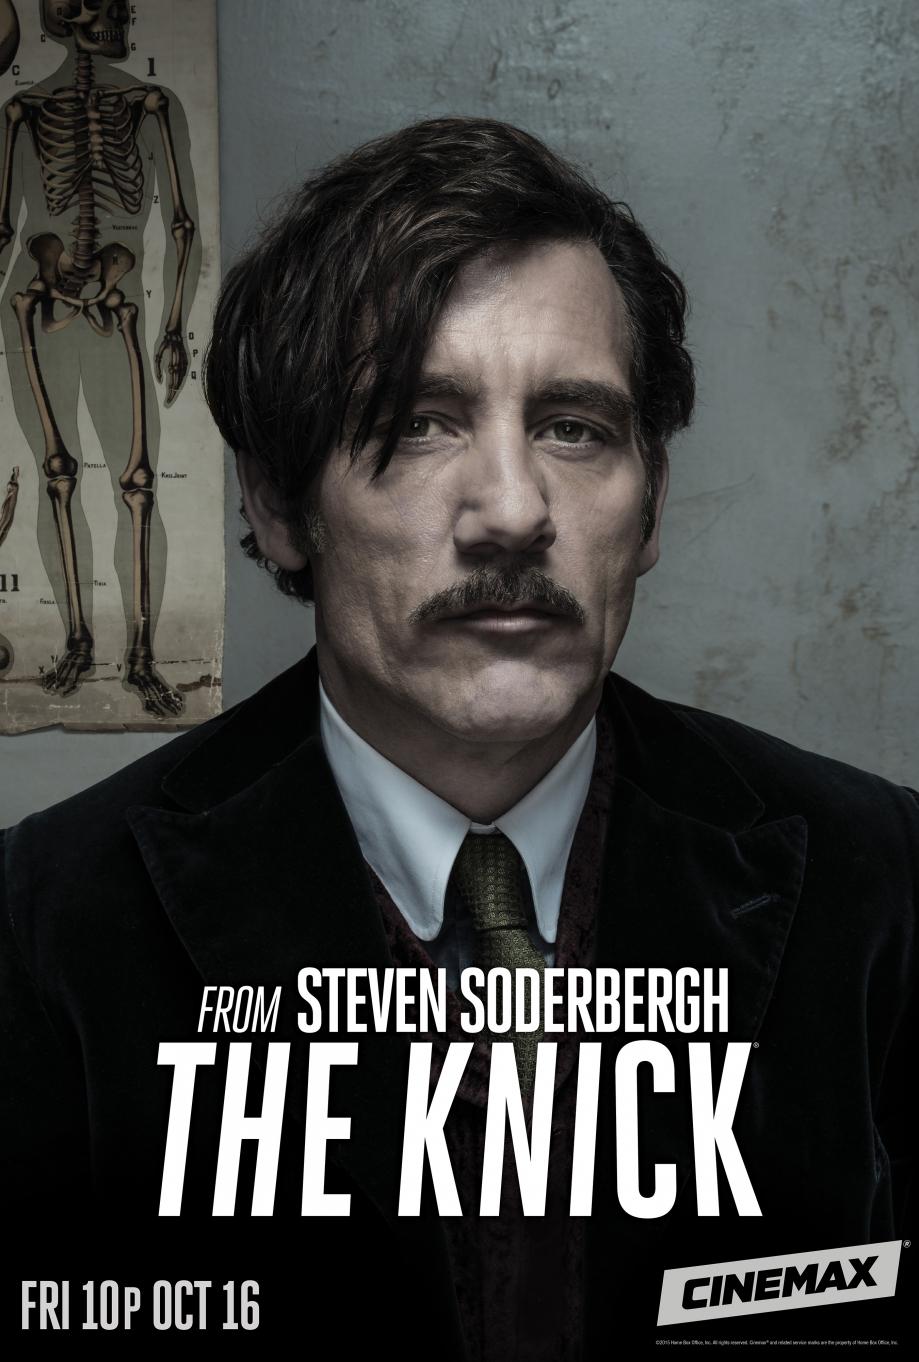 knick-the-saison-2-affiche-945297.jpg